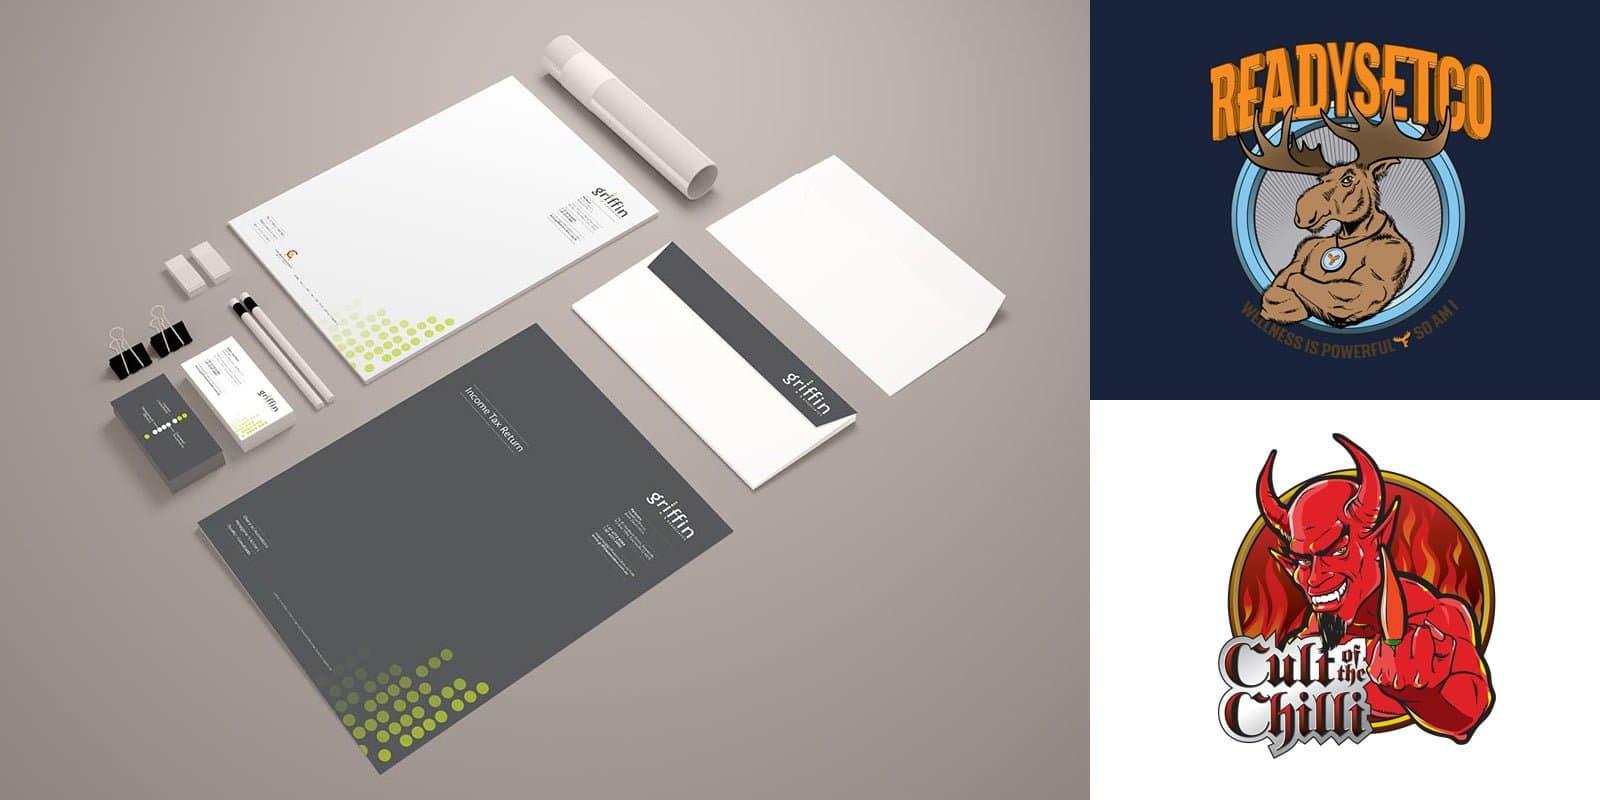 Graphic Design by Zephyrmedia